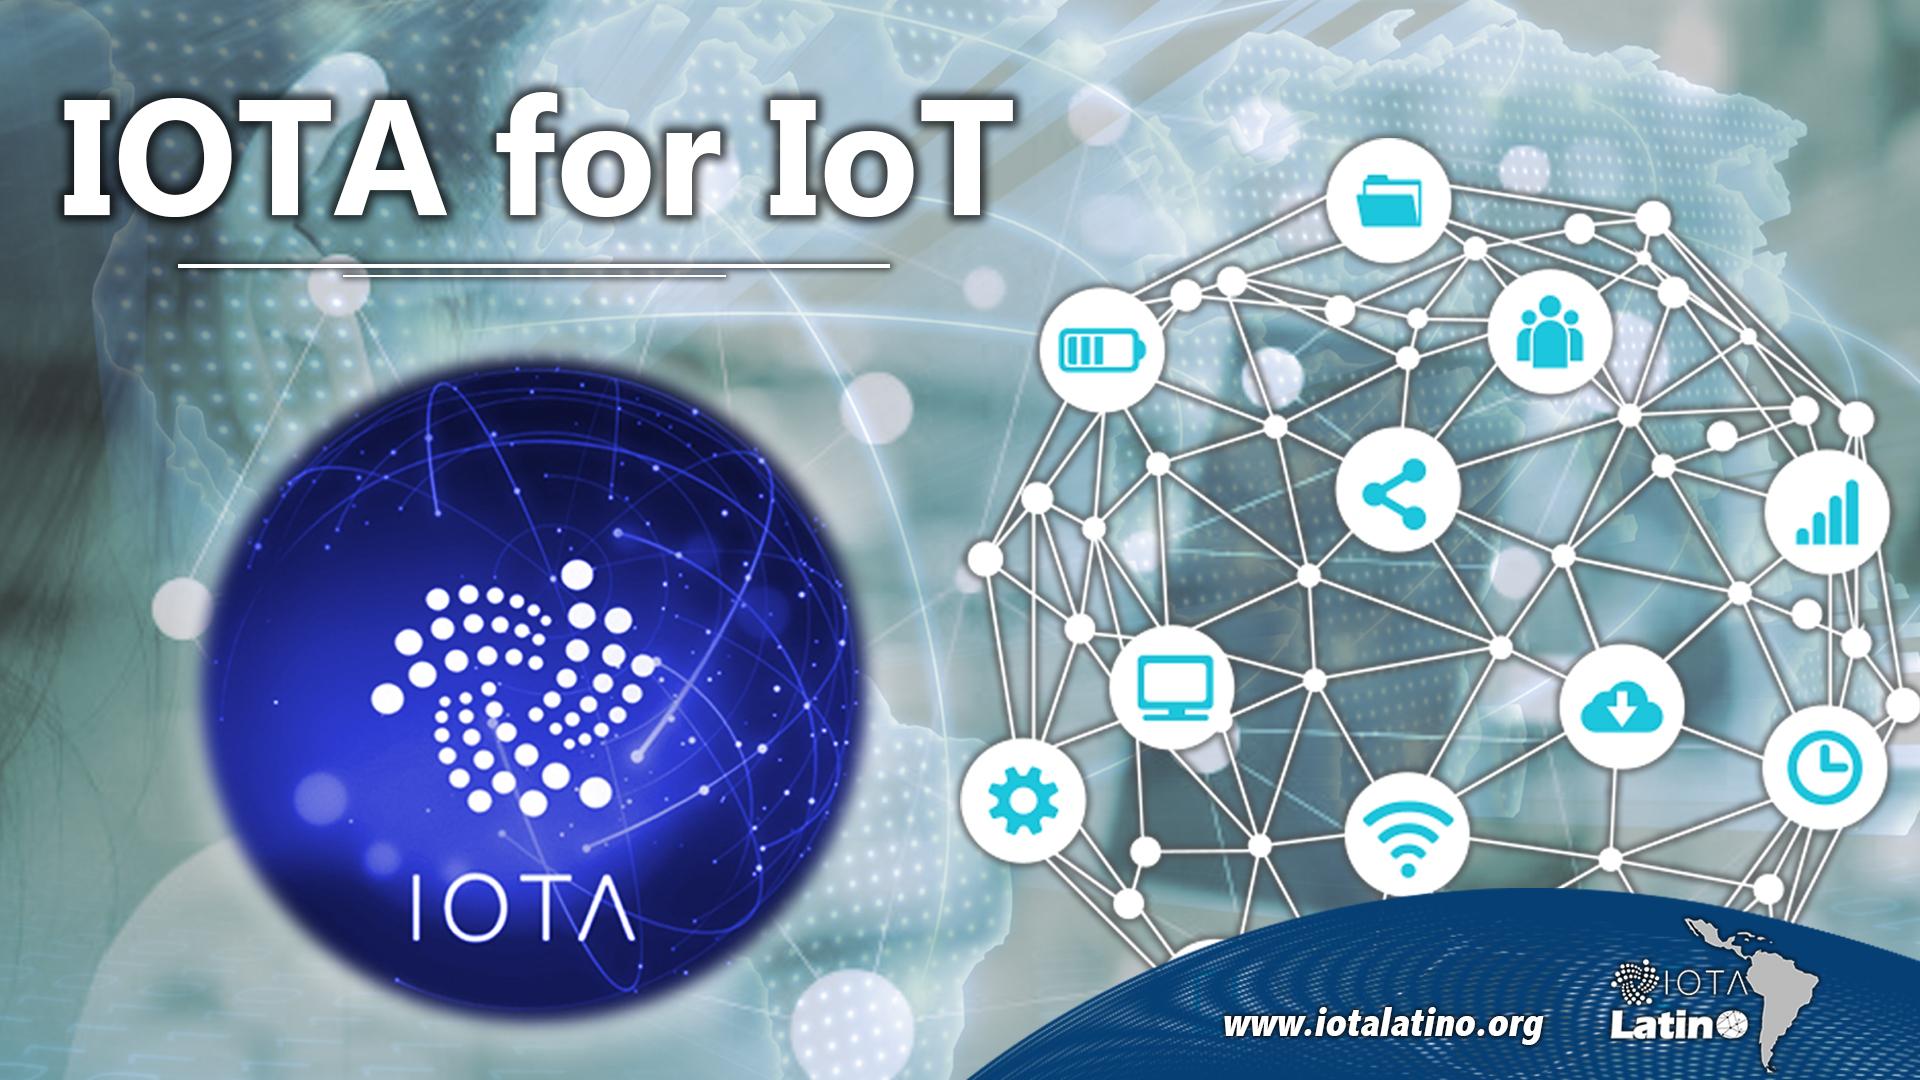 IOTA está reimaginando Blockchain